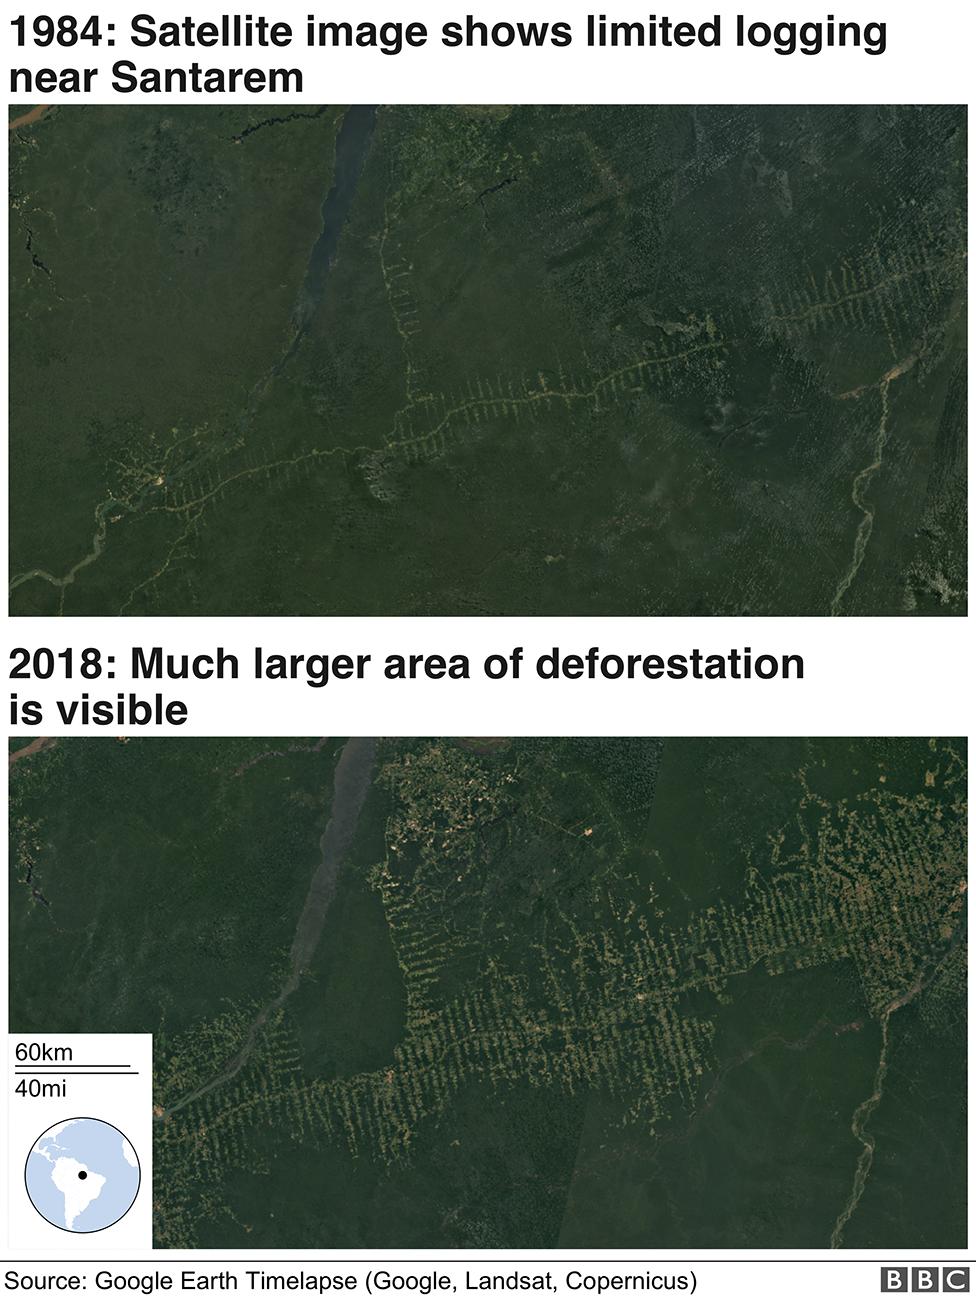 Satellite images of deforestation showing change since 1984